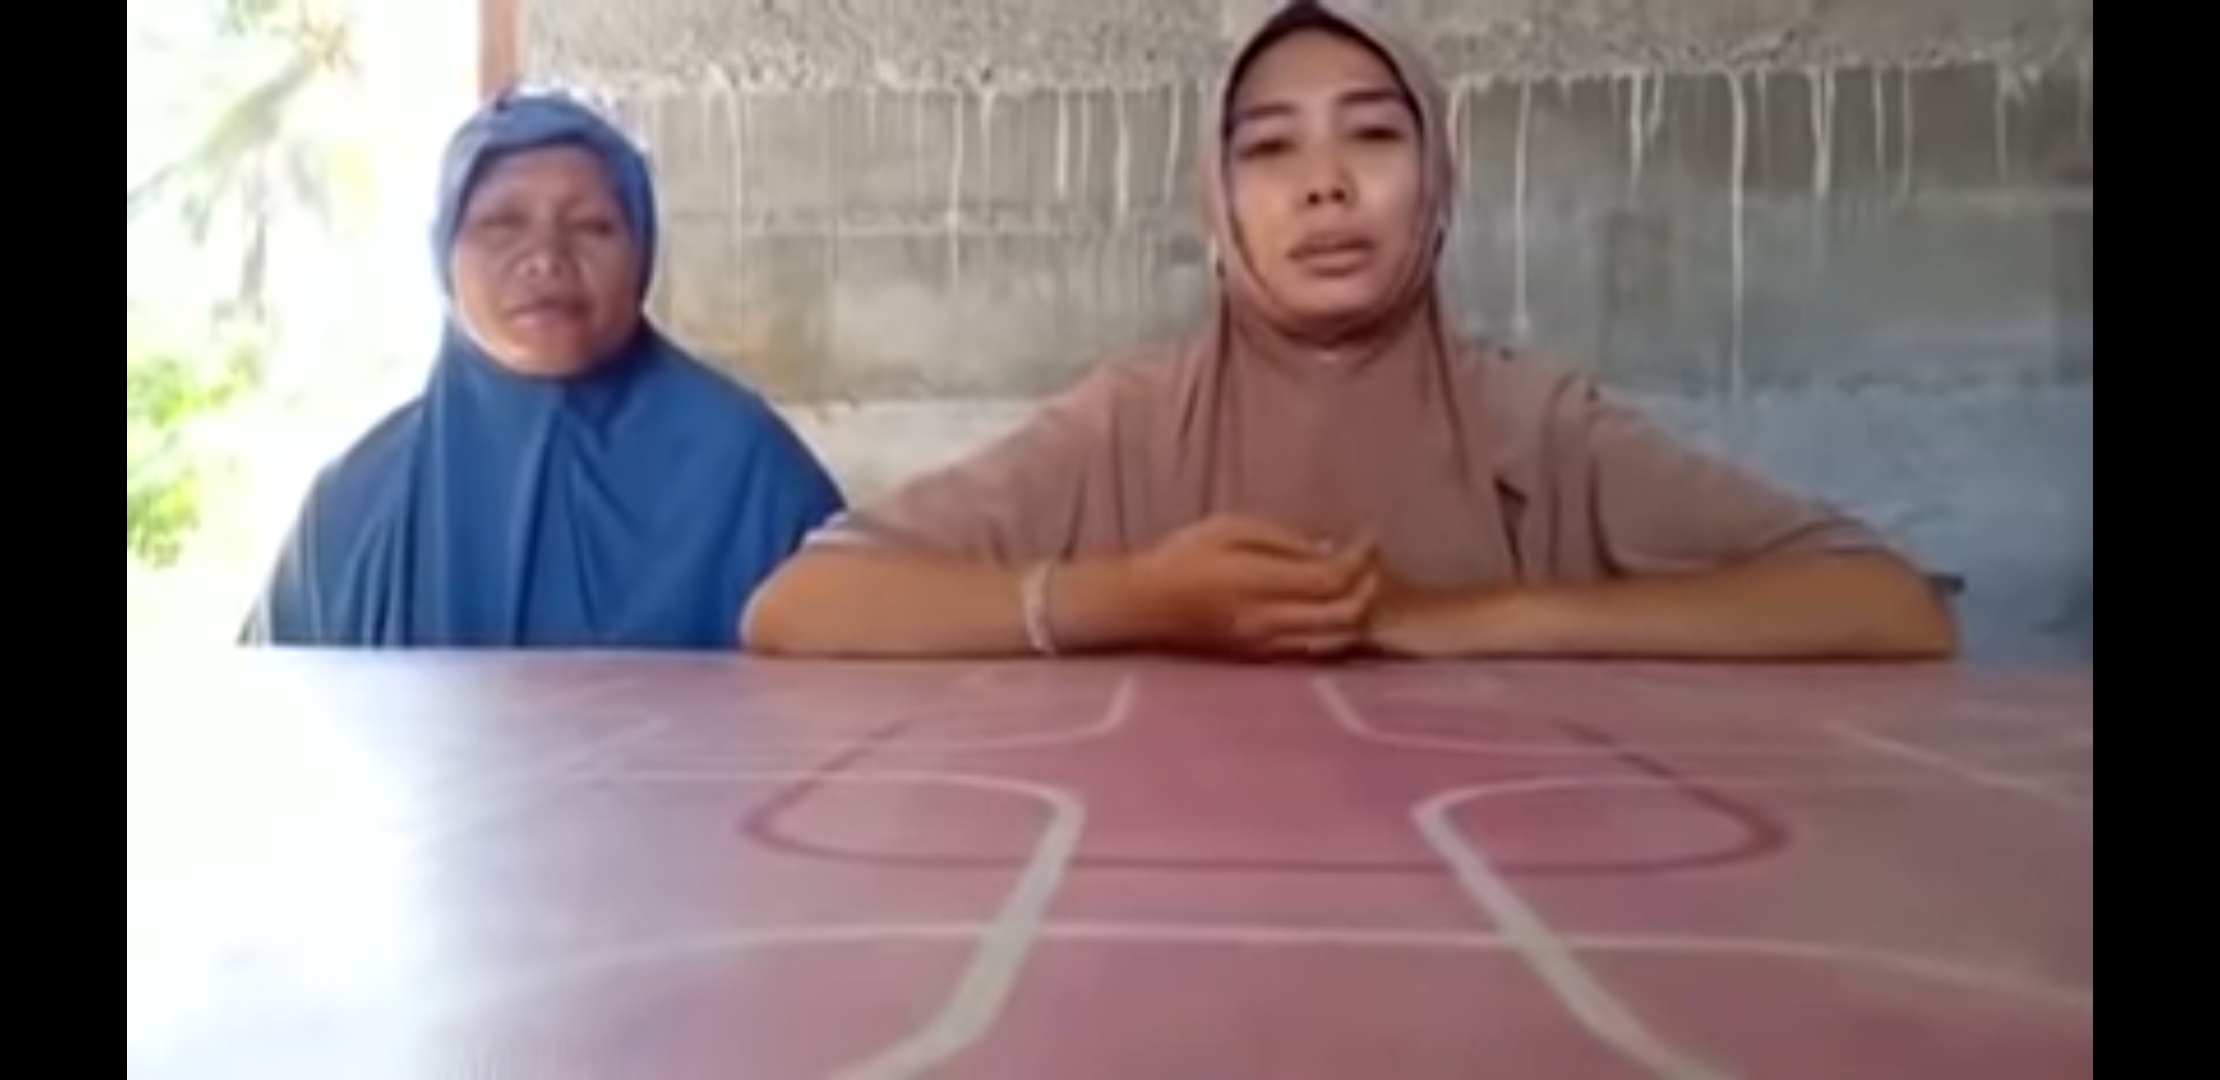 Viral Pengakuan Perempuan Diperkosa Bupati 'Budok', Korban: Saya Diancam Mantan Suami